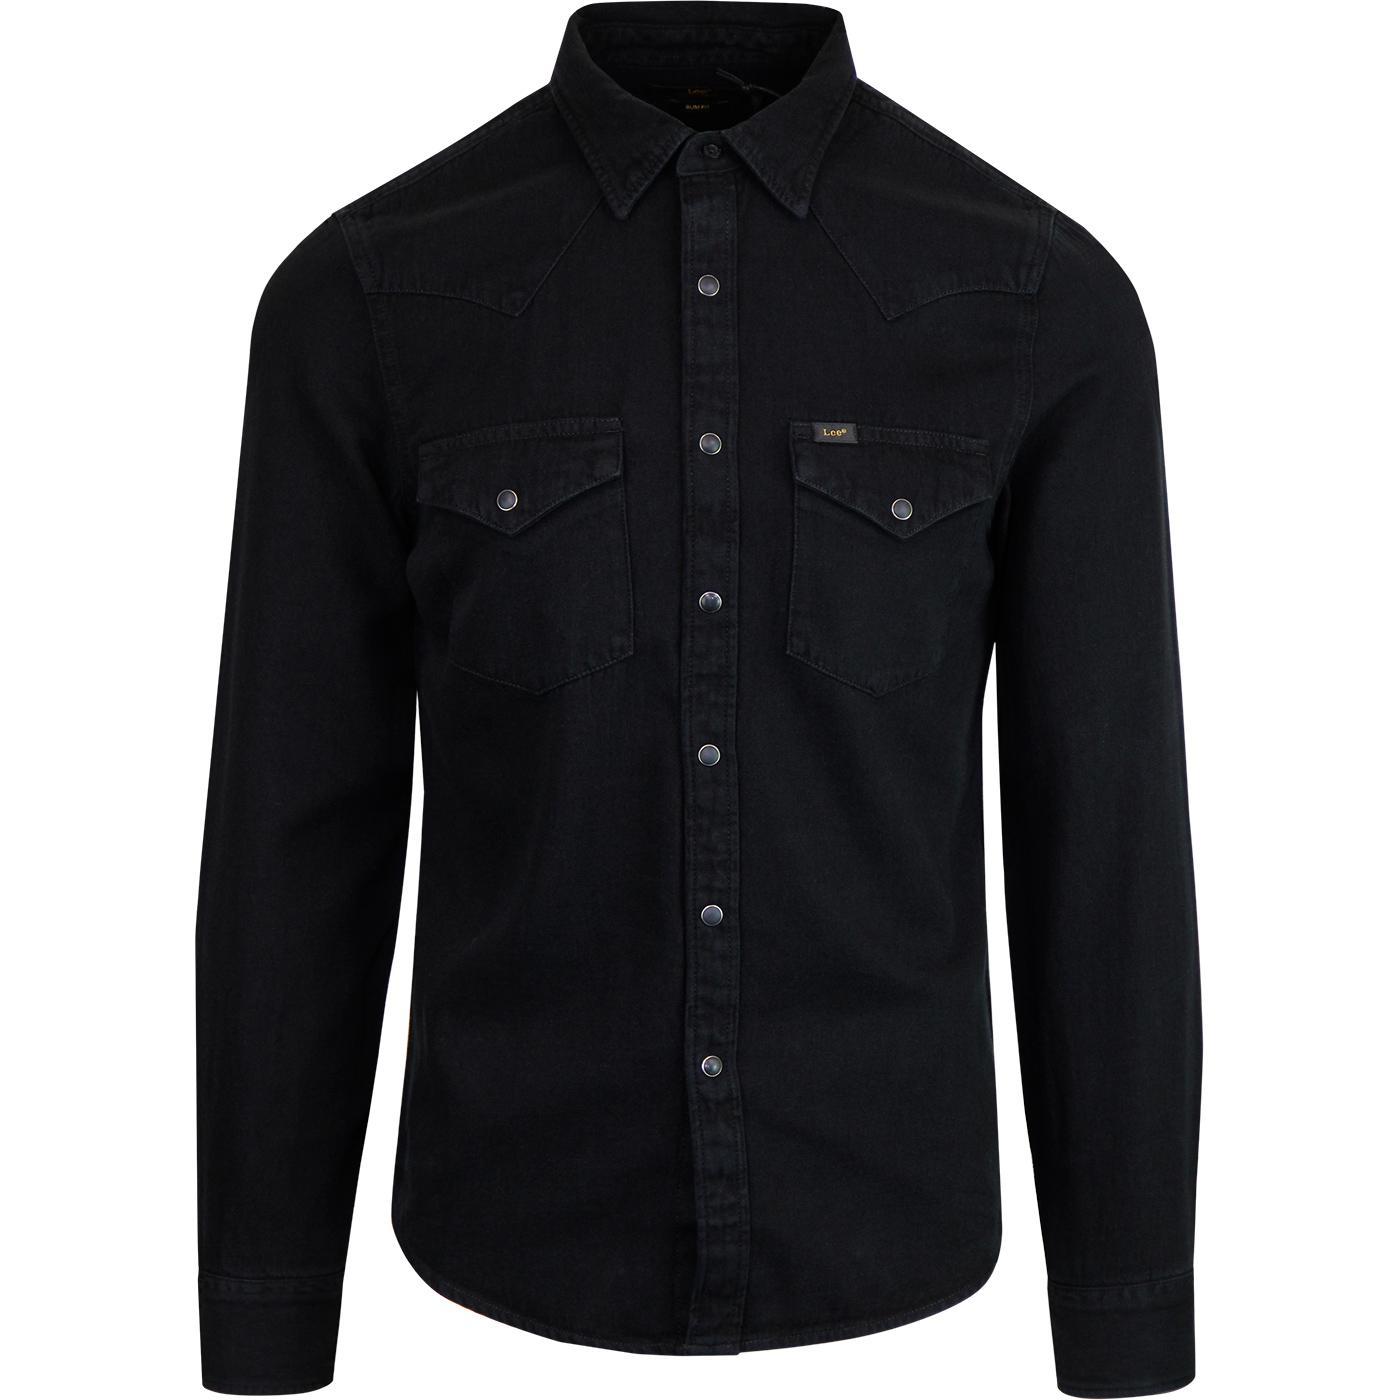 LEE Retro 70s Slim Fit Denim Western Shirt (Black)